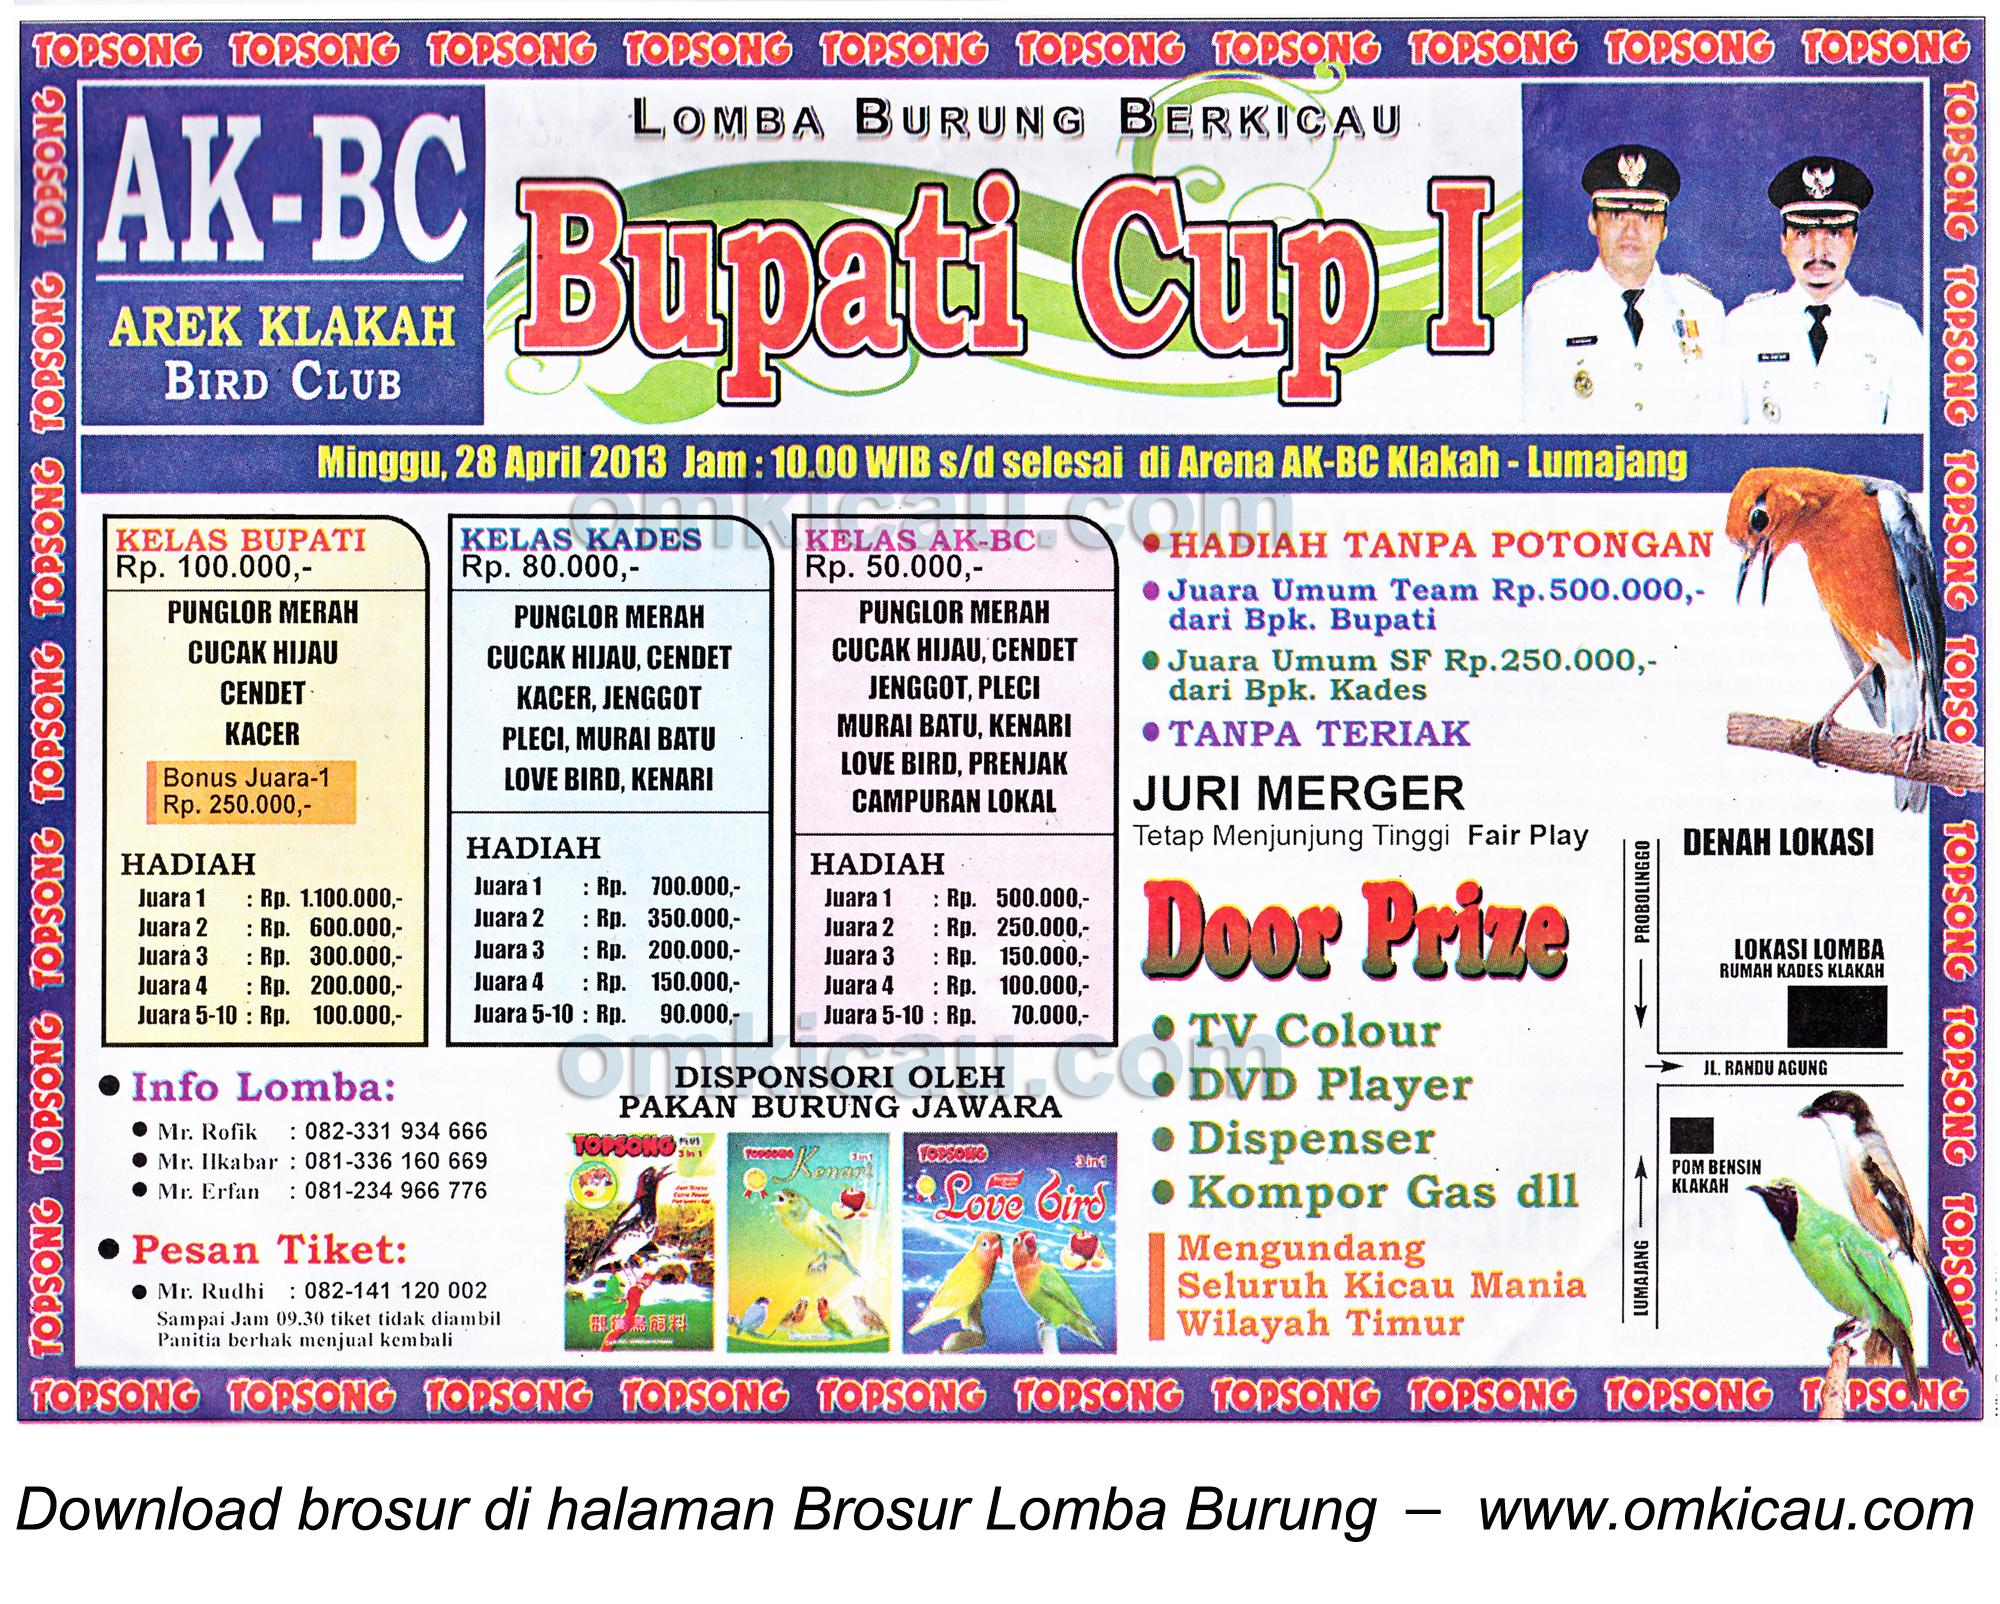 Brosur Lomba Burung Bupati Cup I, Lumajang, 28 April 2013